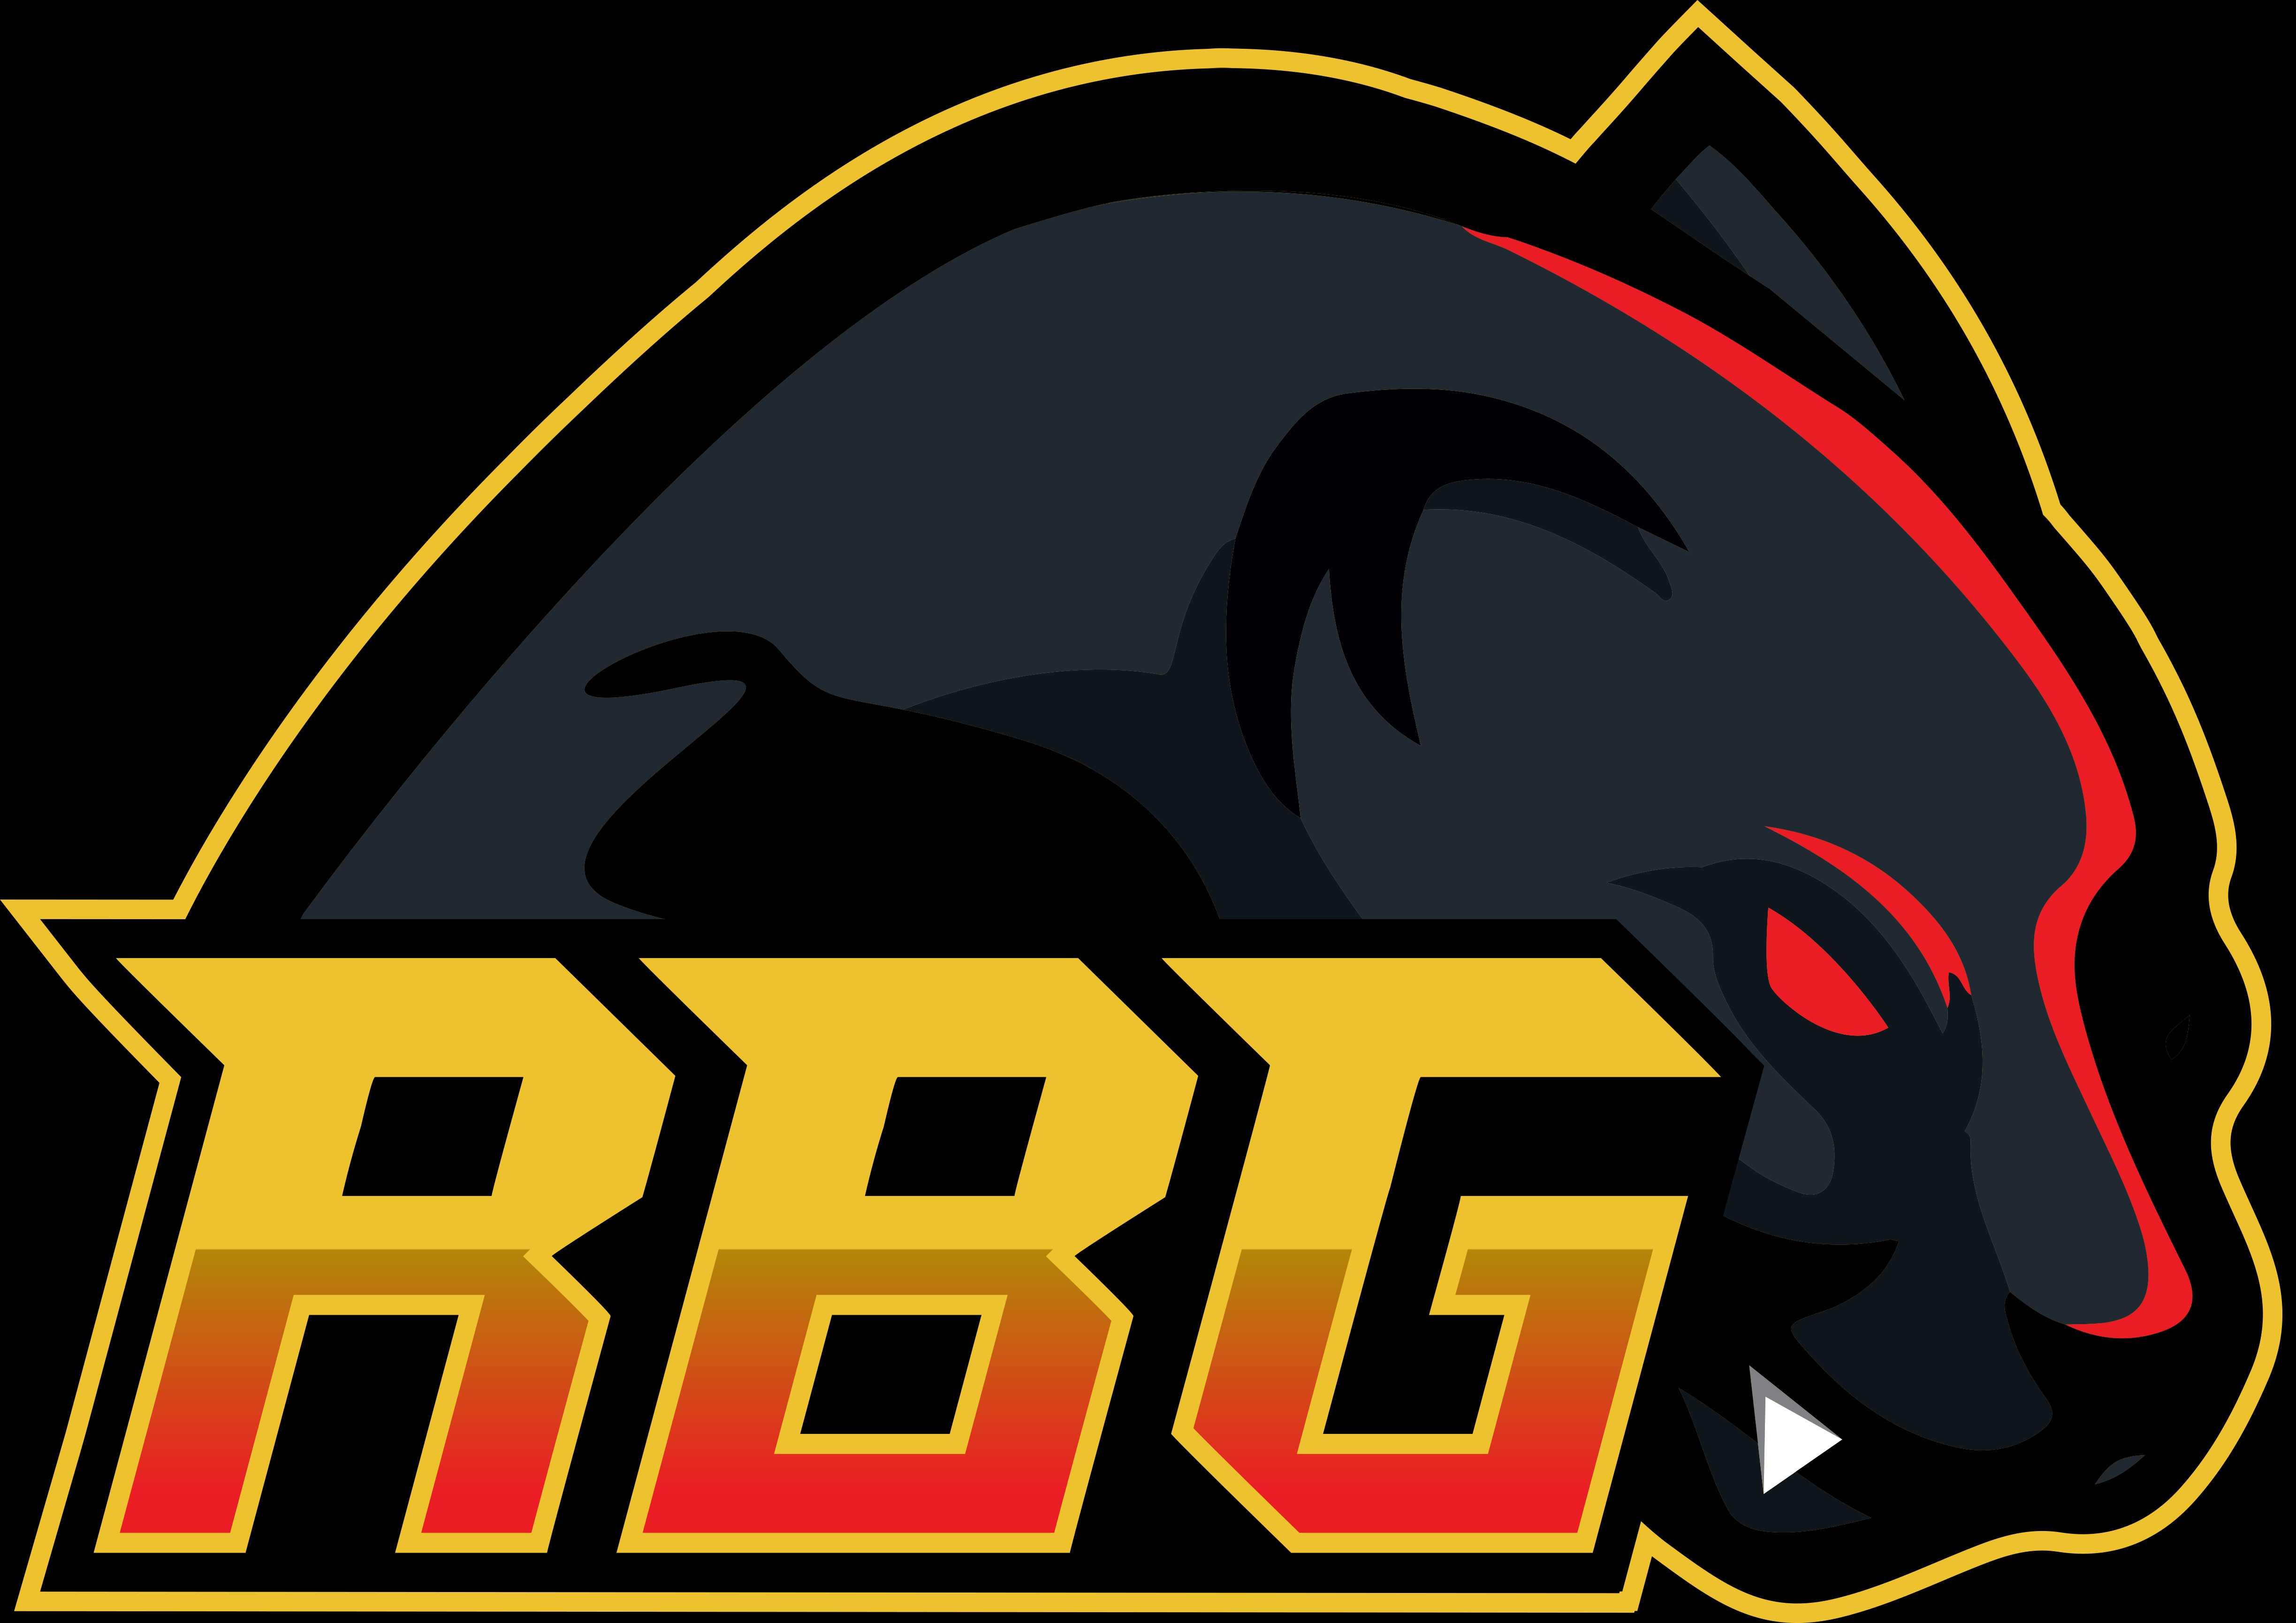 RBG Esportss's logo